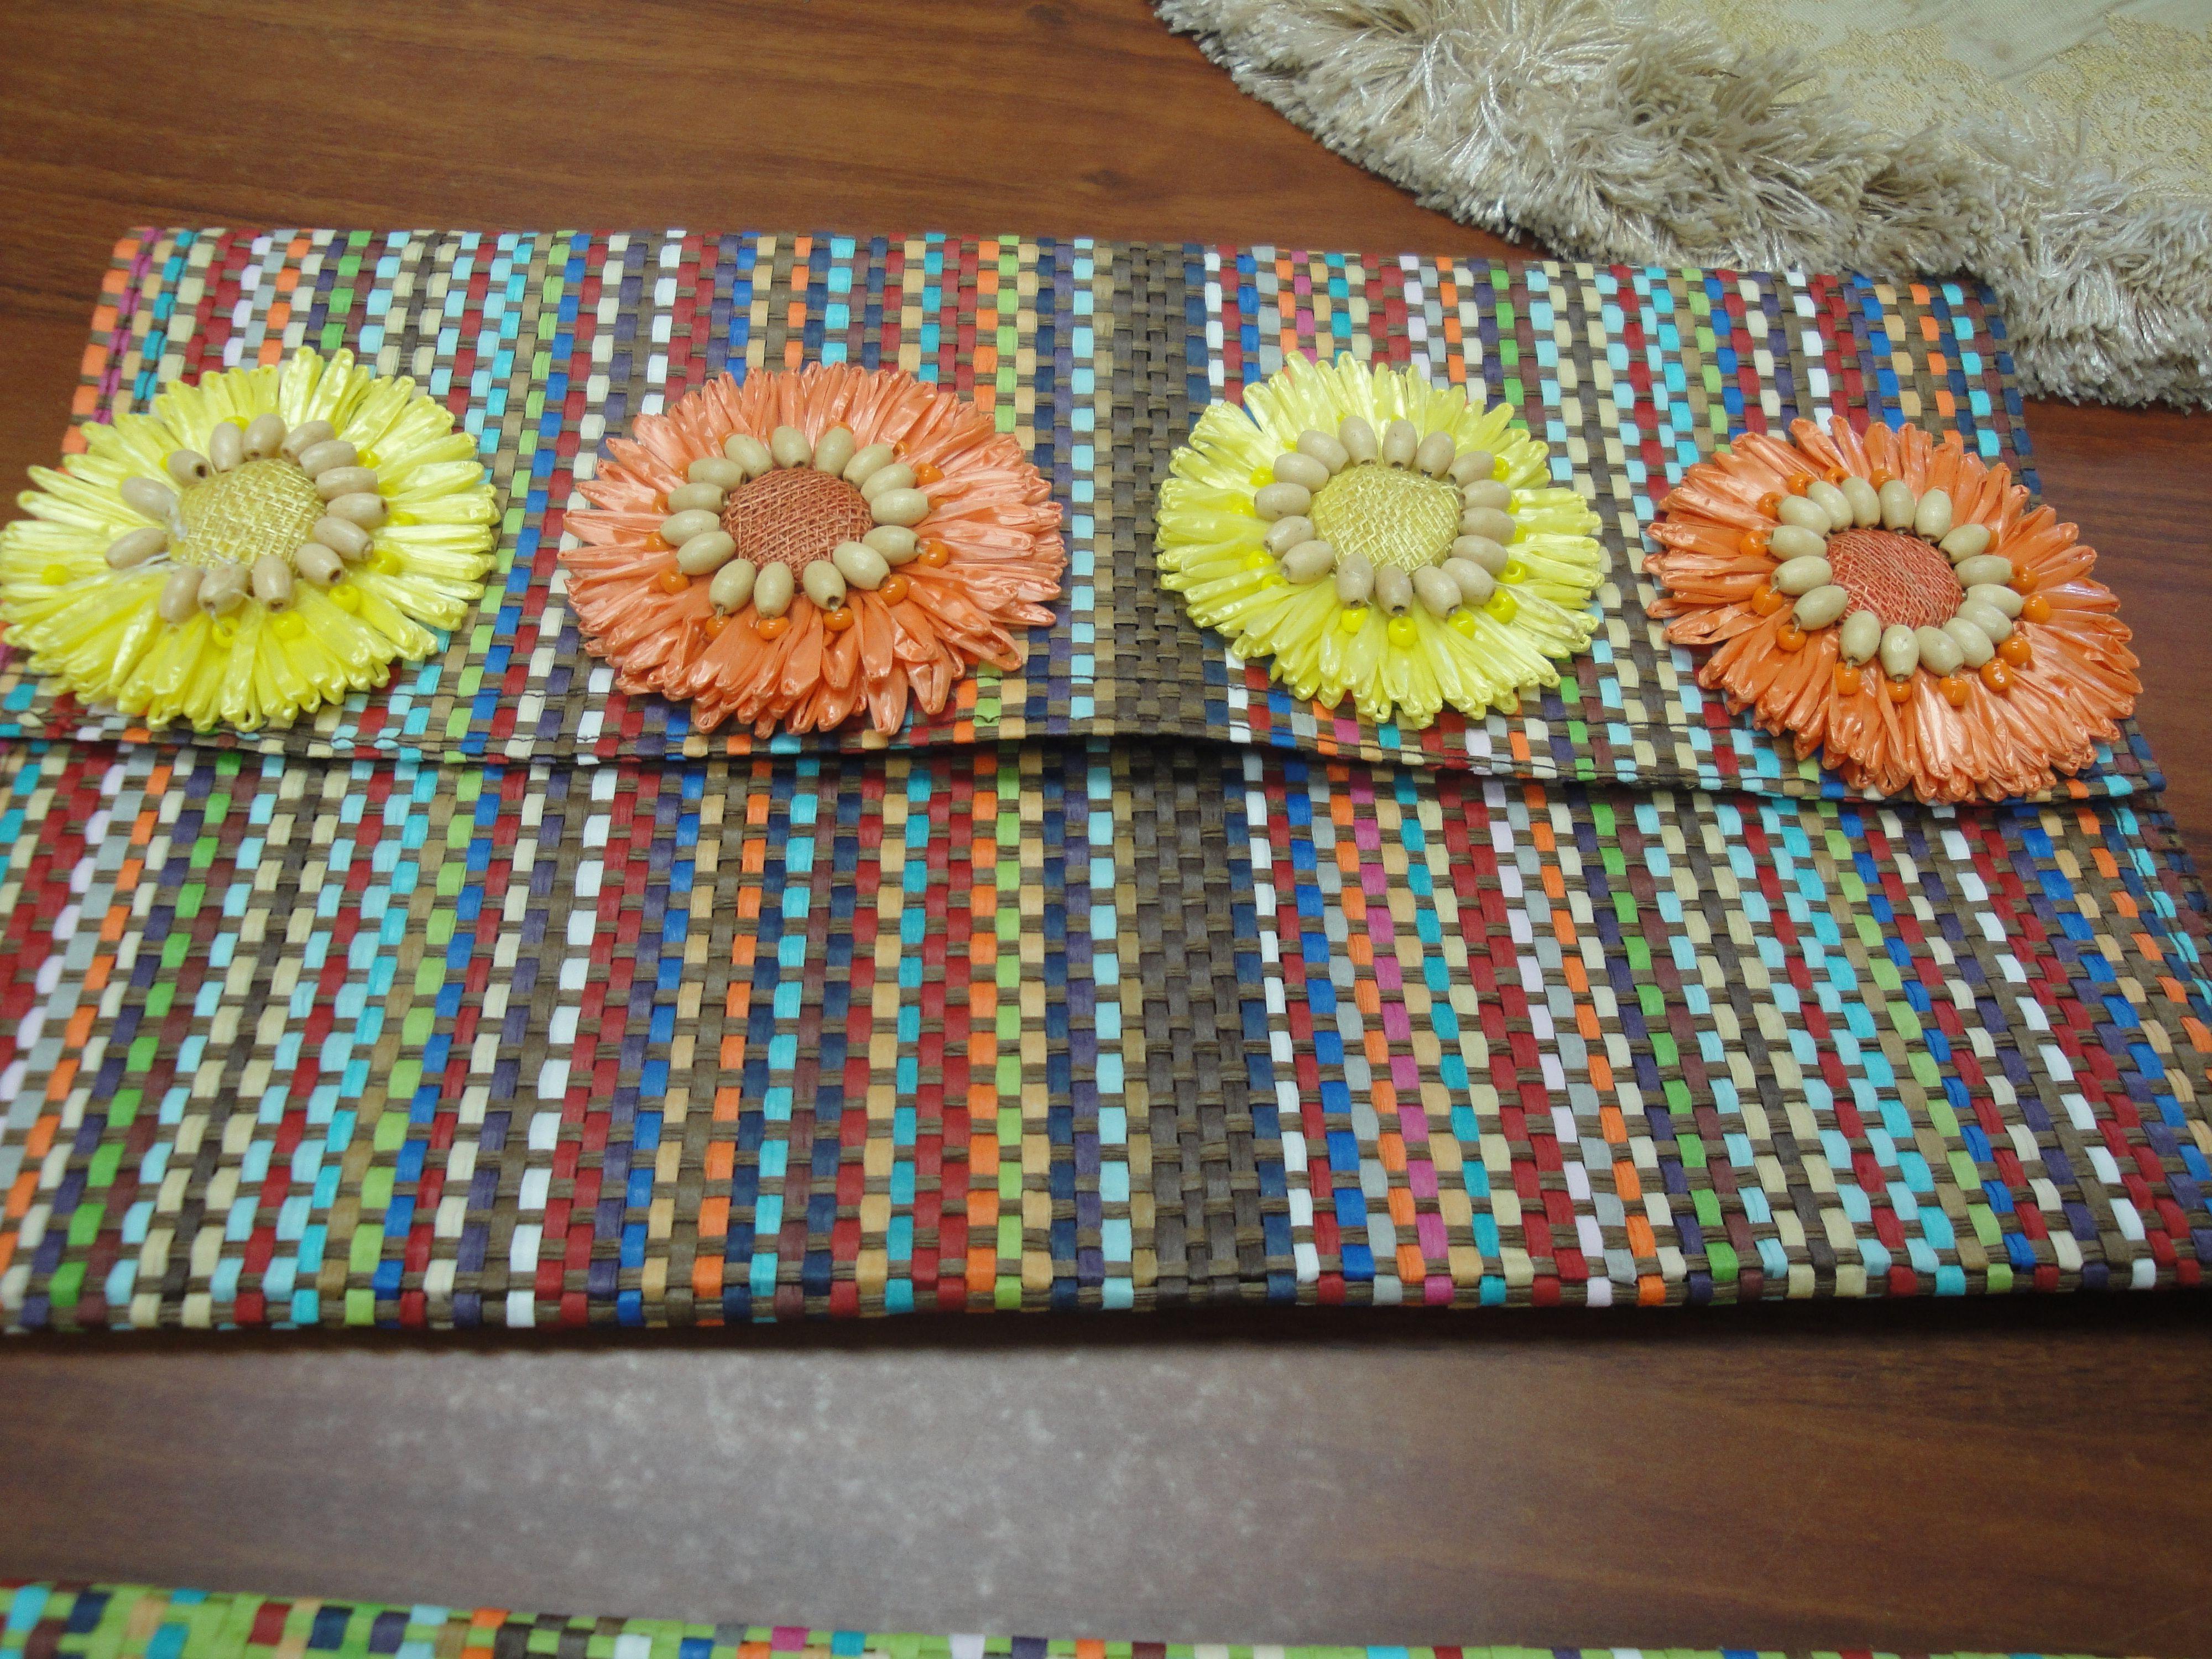 Carteras hechas con individuales de mesa carteras hechas a mano pinterest crochet and craft - Individuales para mesa ...